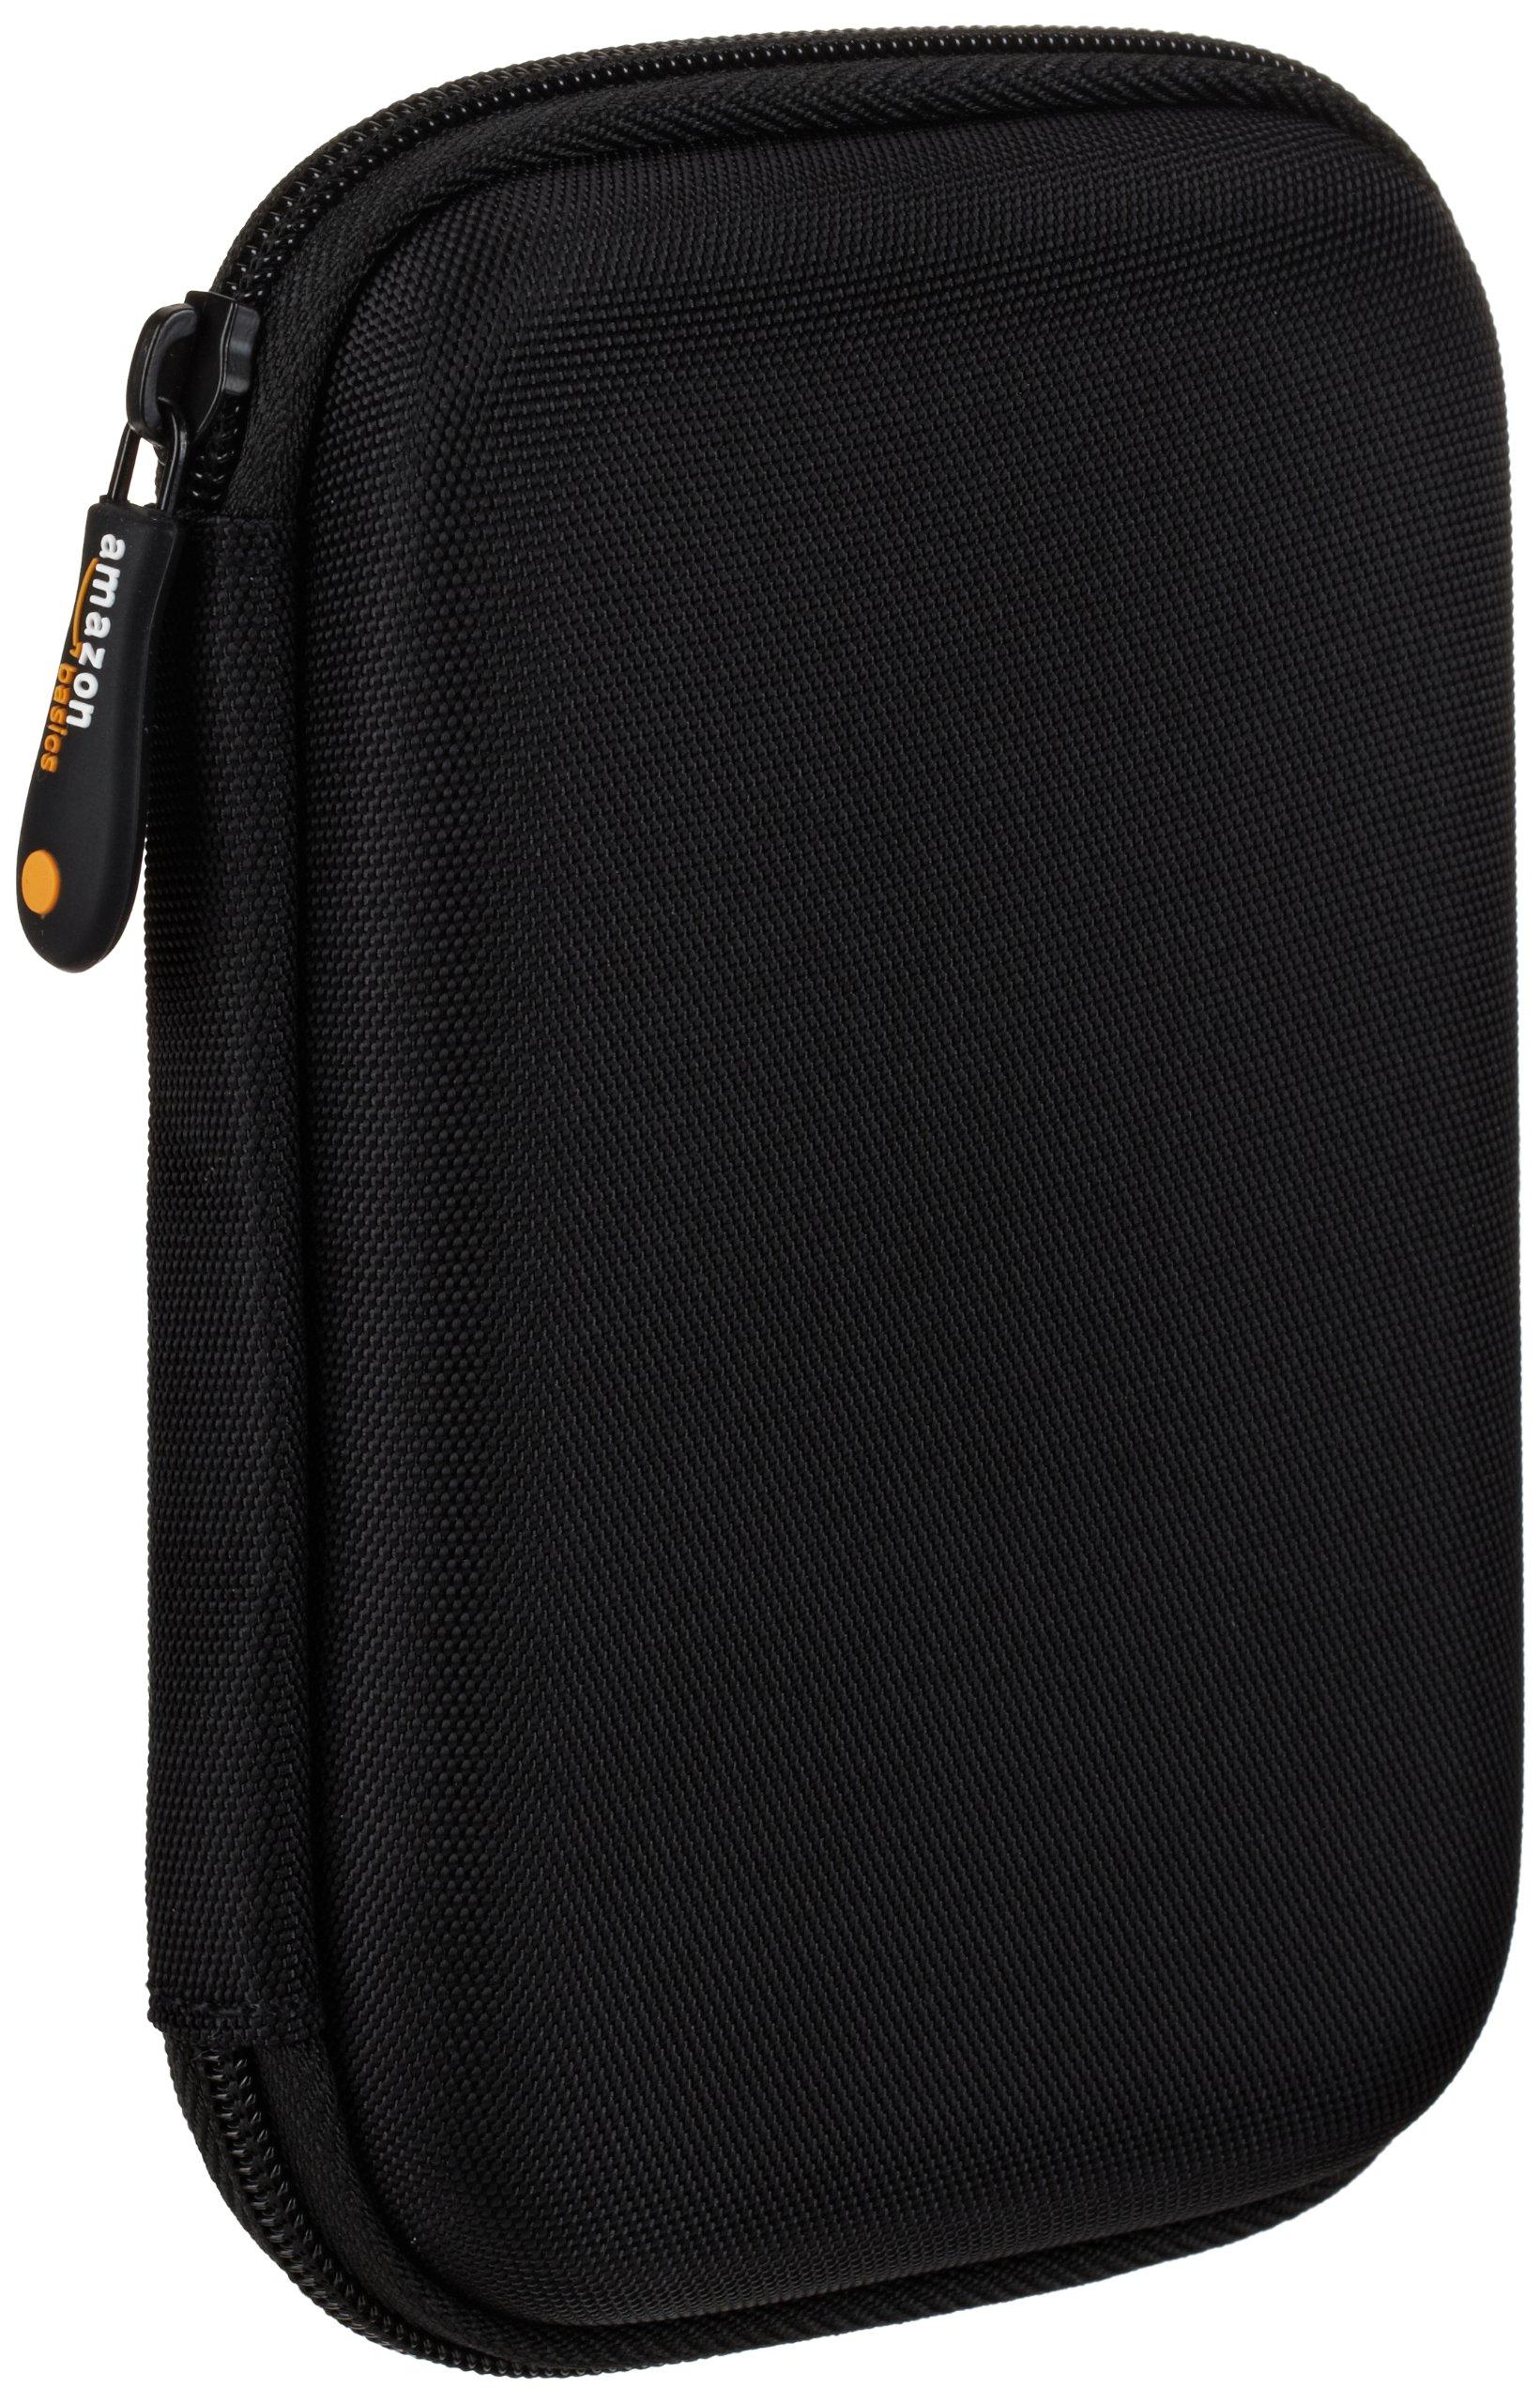 AmazonBasics External Hard Drive Case - 10-Pack